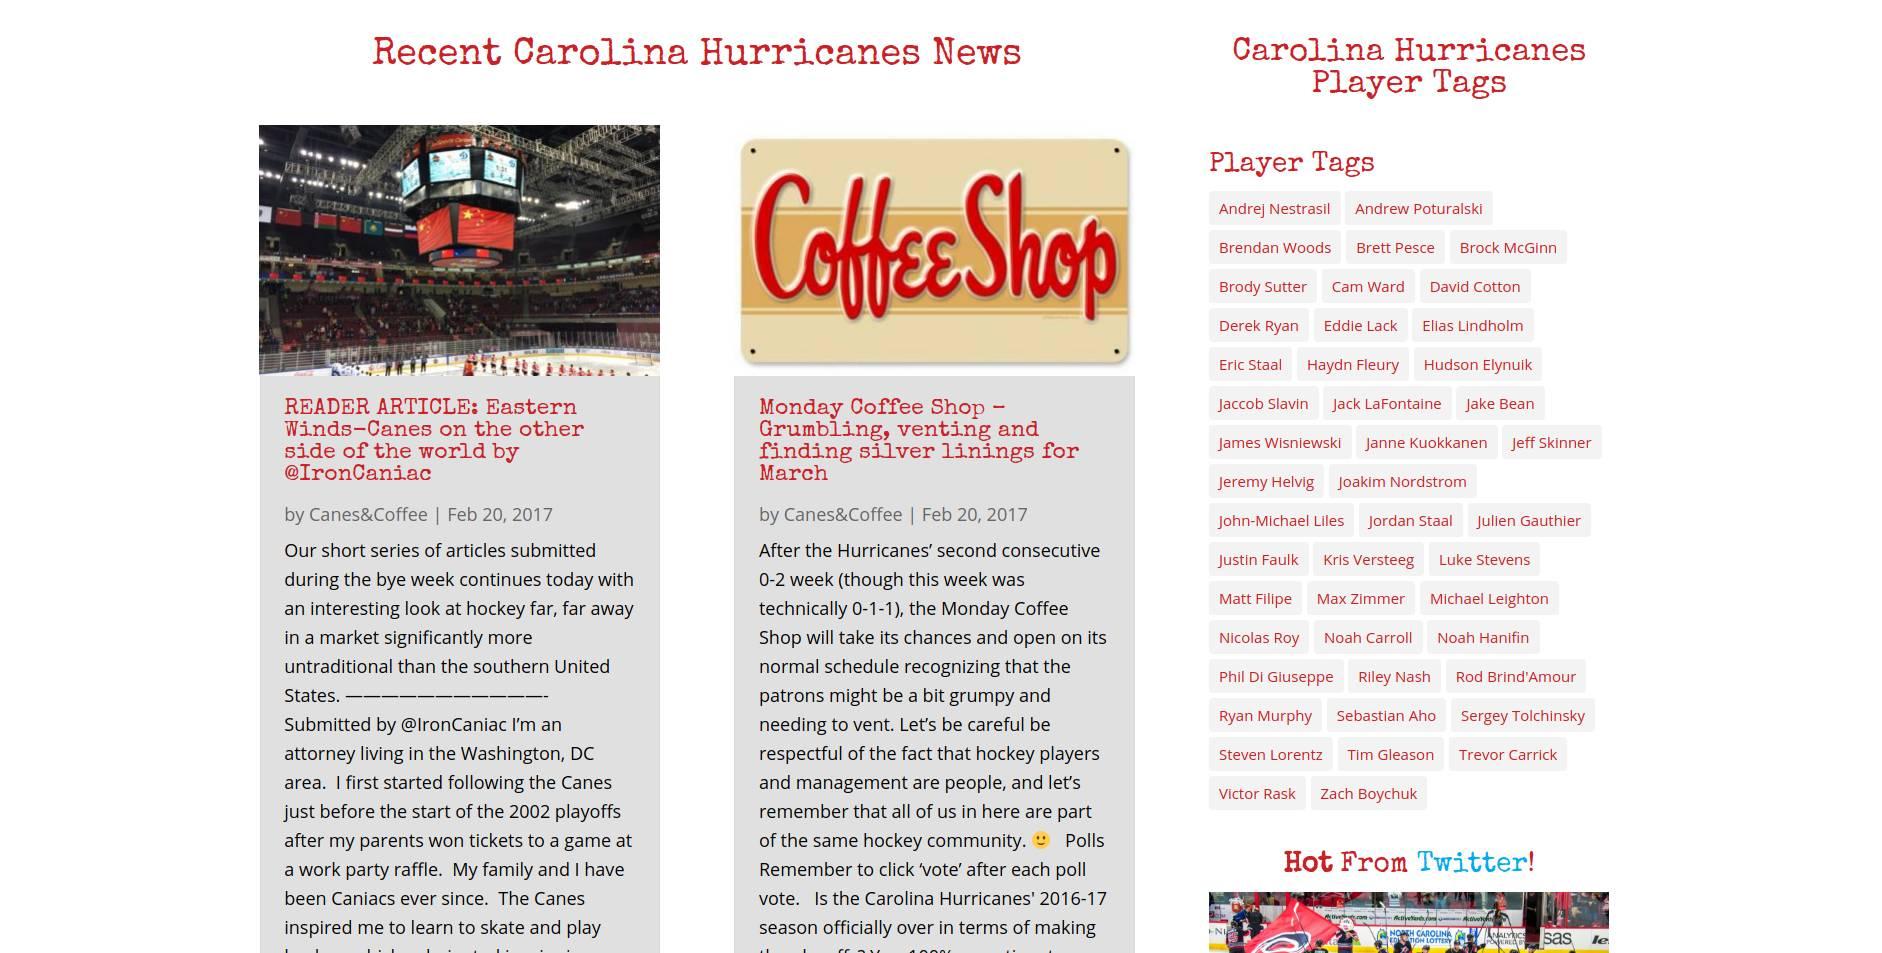 carolina-hurricanes-news-raleigh-nc